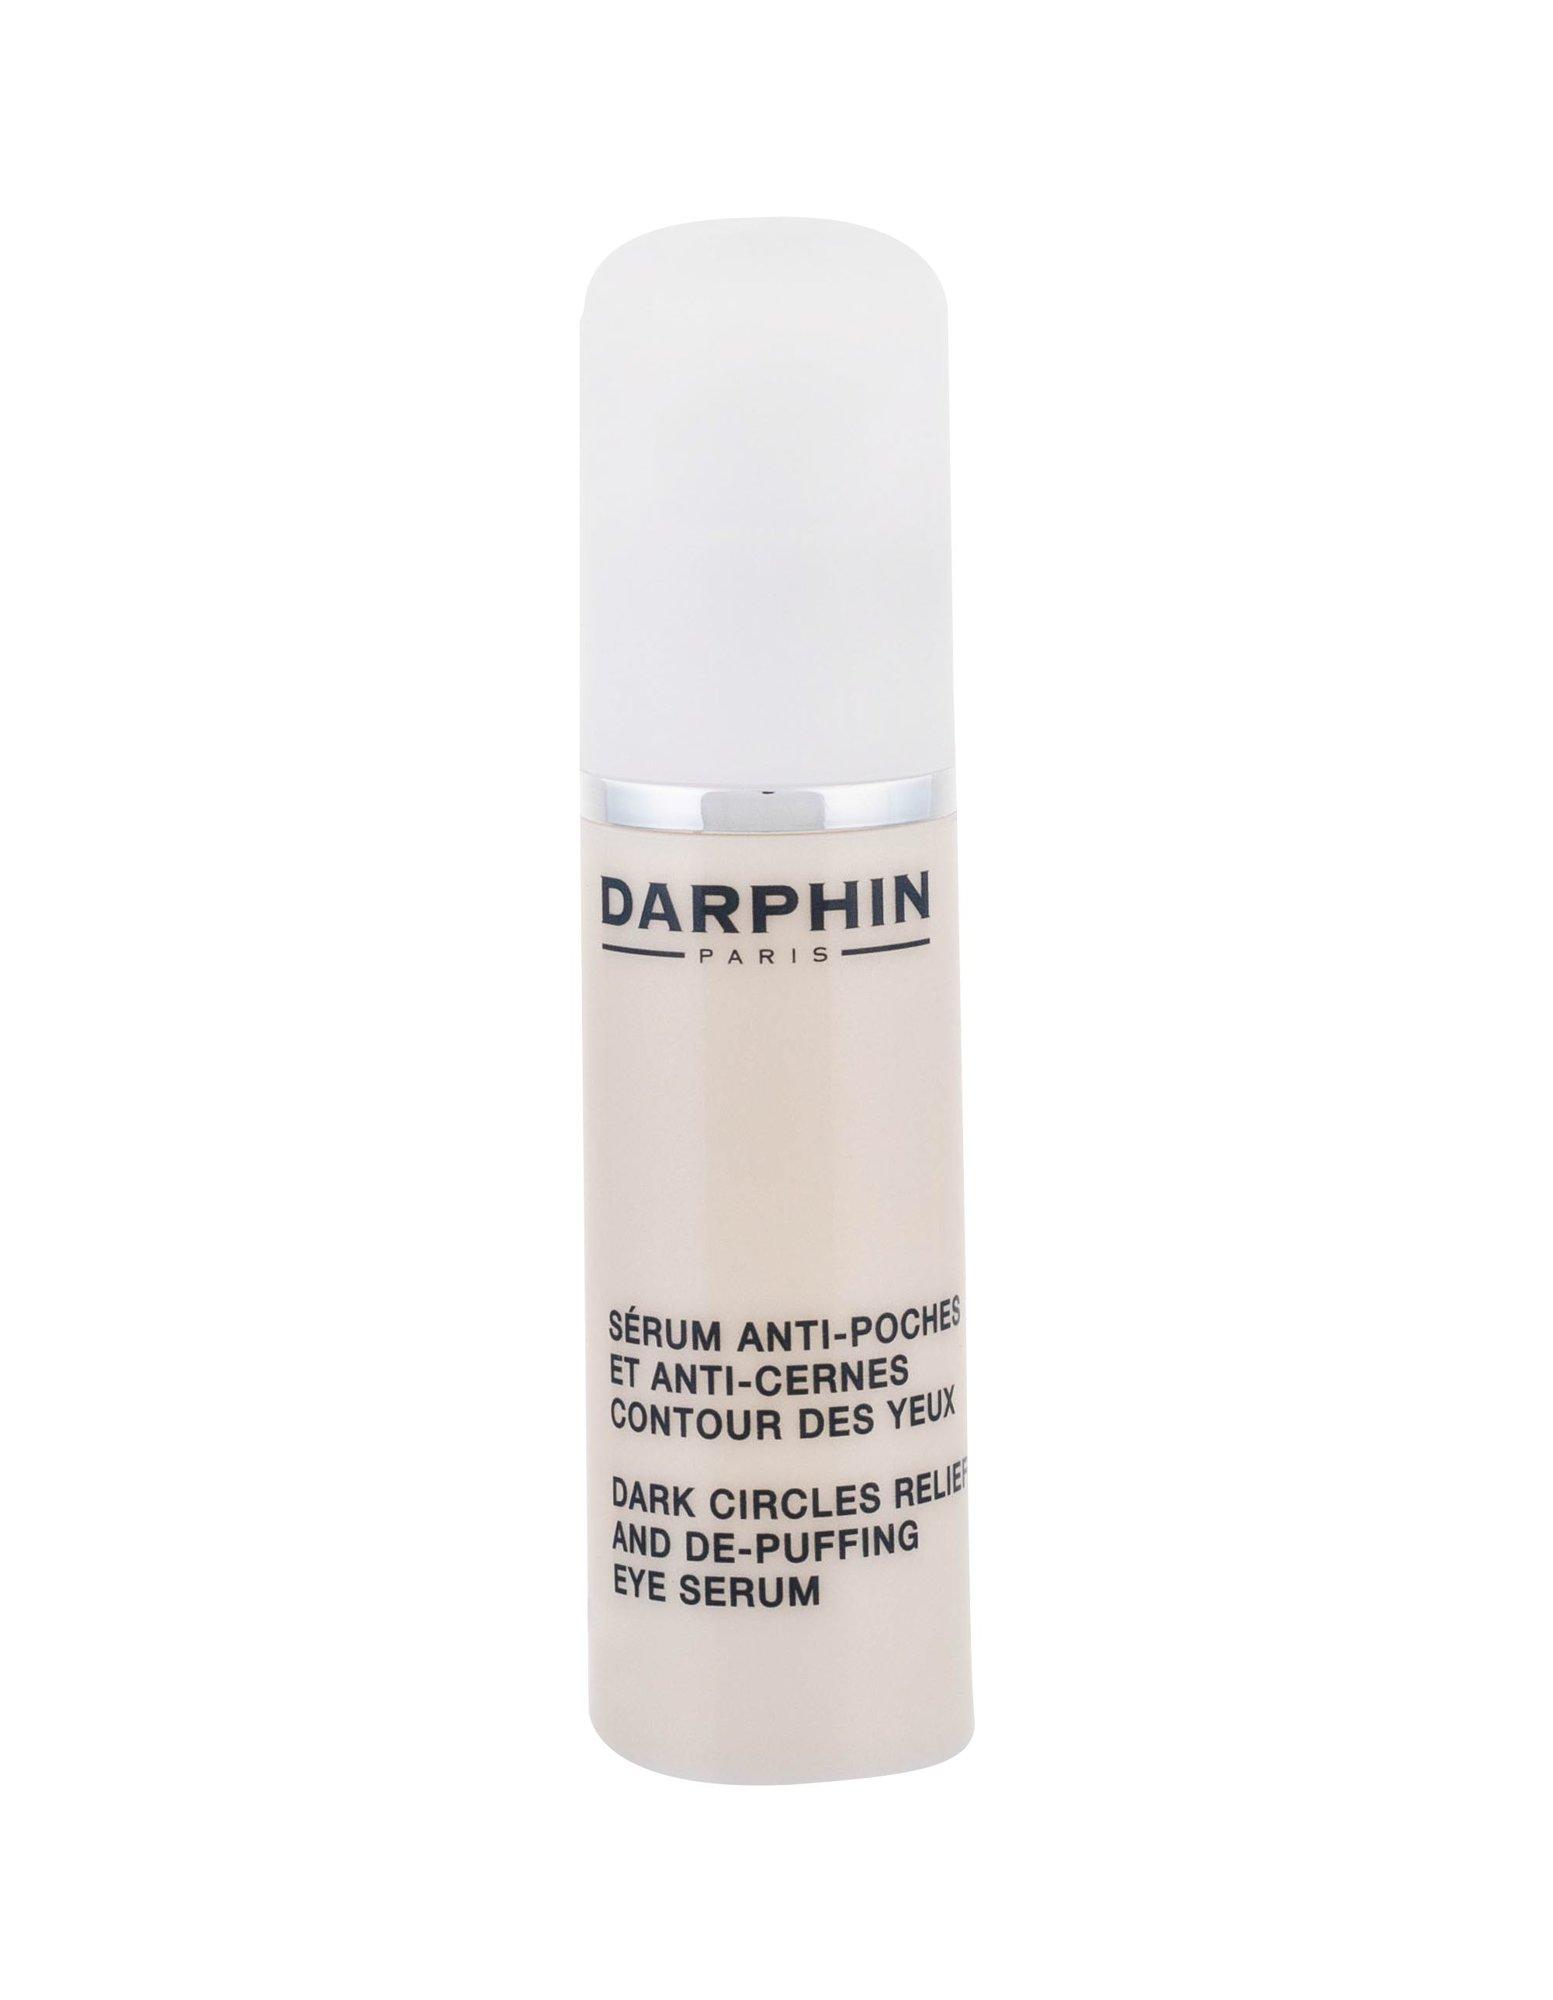 Darphin Eye Care Eye Gel 15ml  Dark Circles Relief And De-Puffing Eye Serum